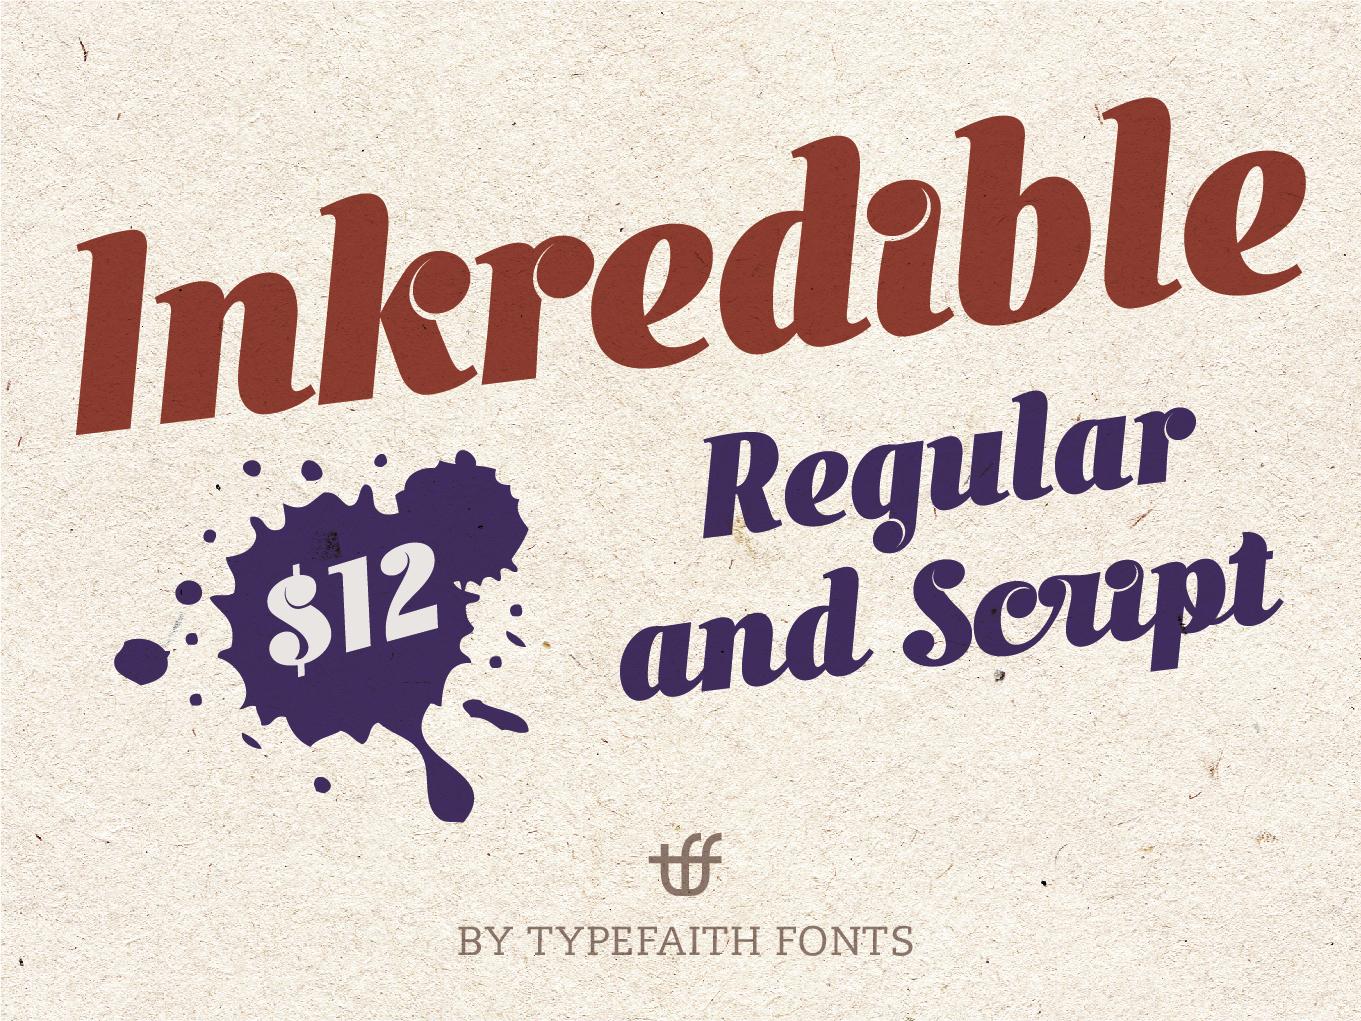 Inkredible Leon Hulst TypeFaith Fonts